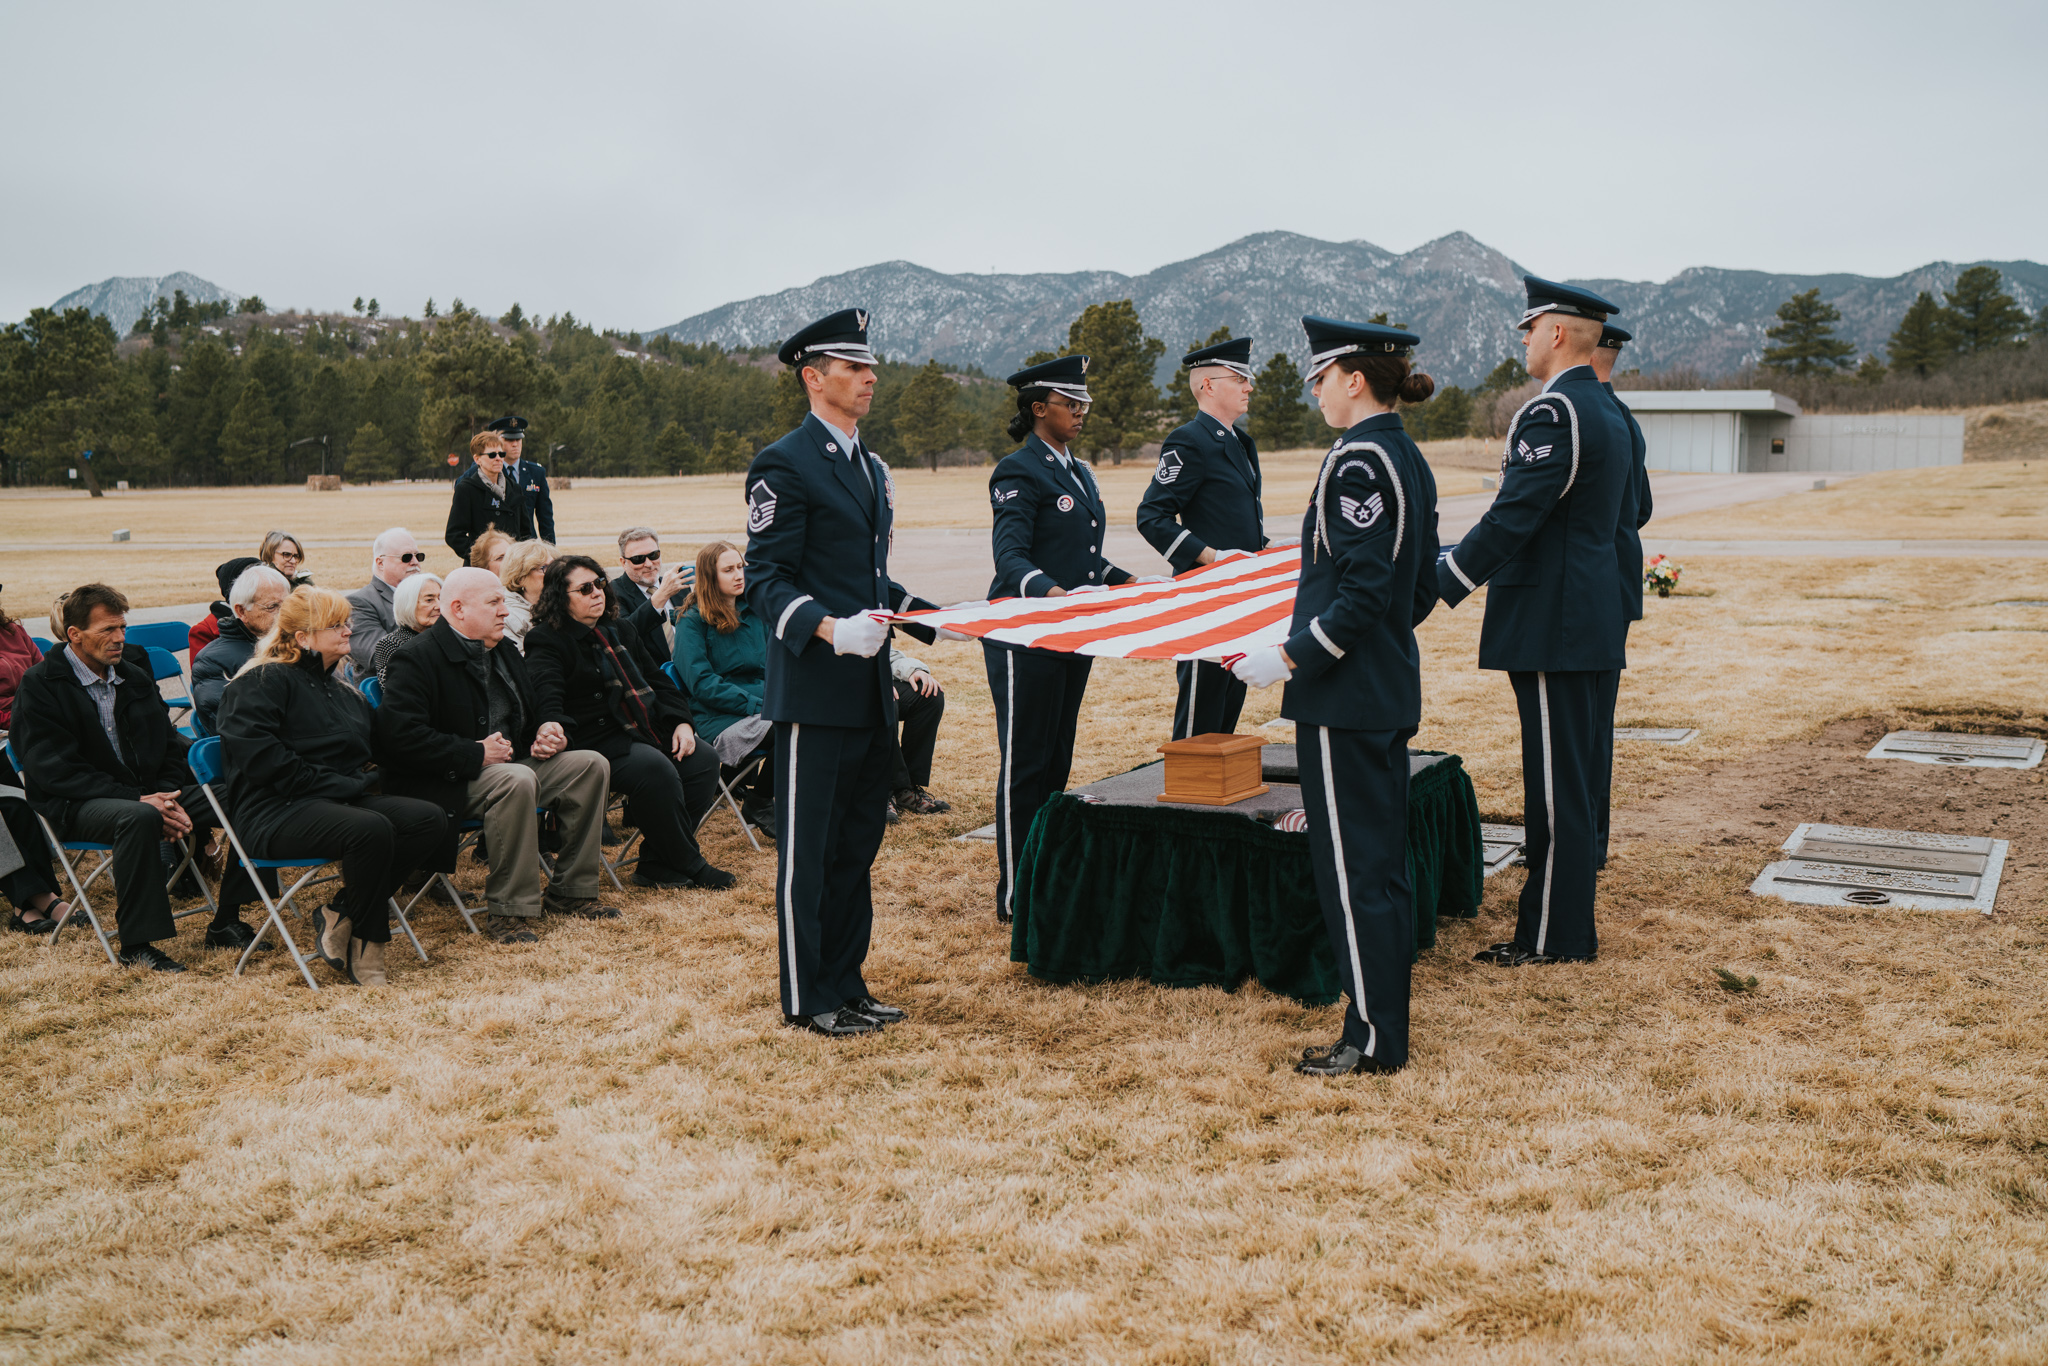 usafa-colorado-military-honours-burial-funeral-photography-grace-elizabeth-colchester-essex-alternative-wedding-lifestyle-photographer (45 of 127).jpg